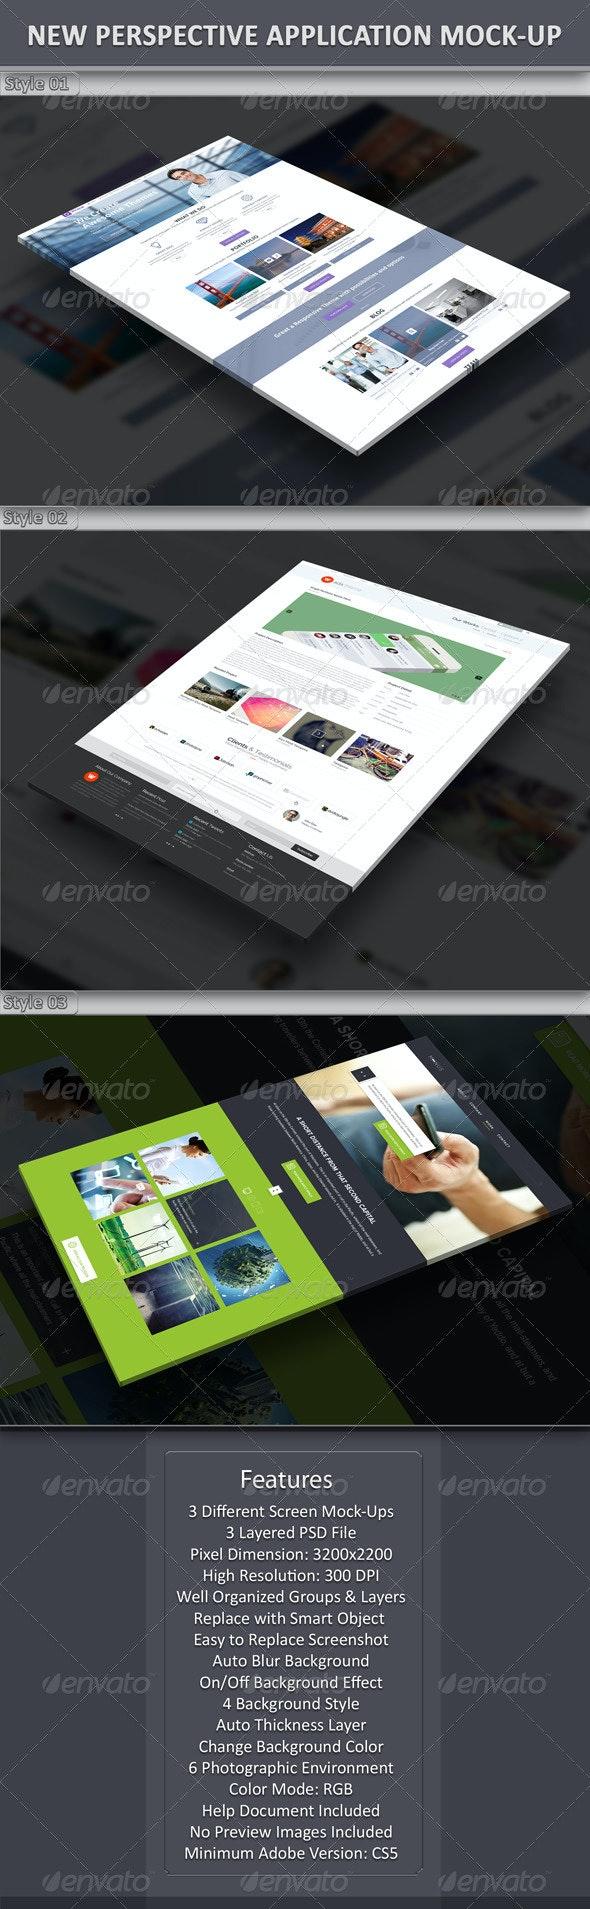 New Perspective Application Mock-Up - Website Displays